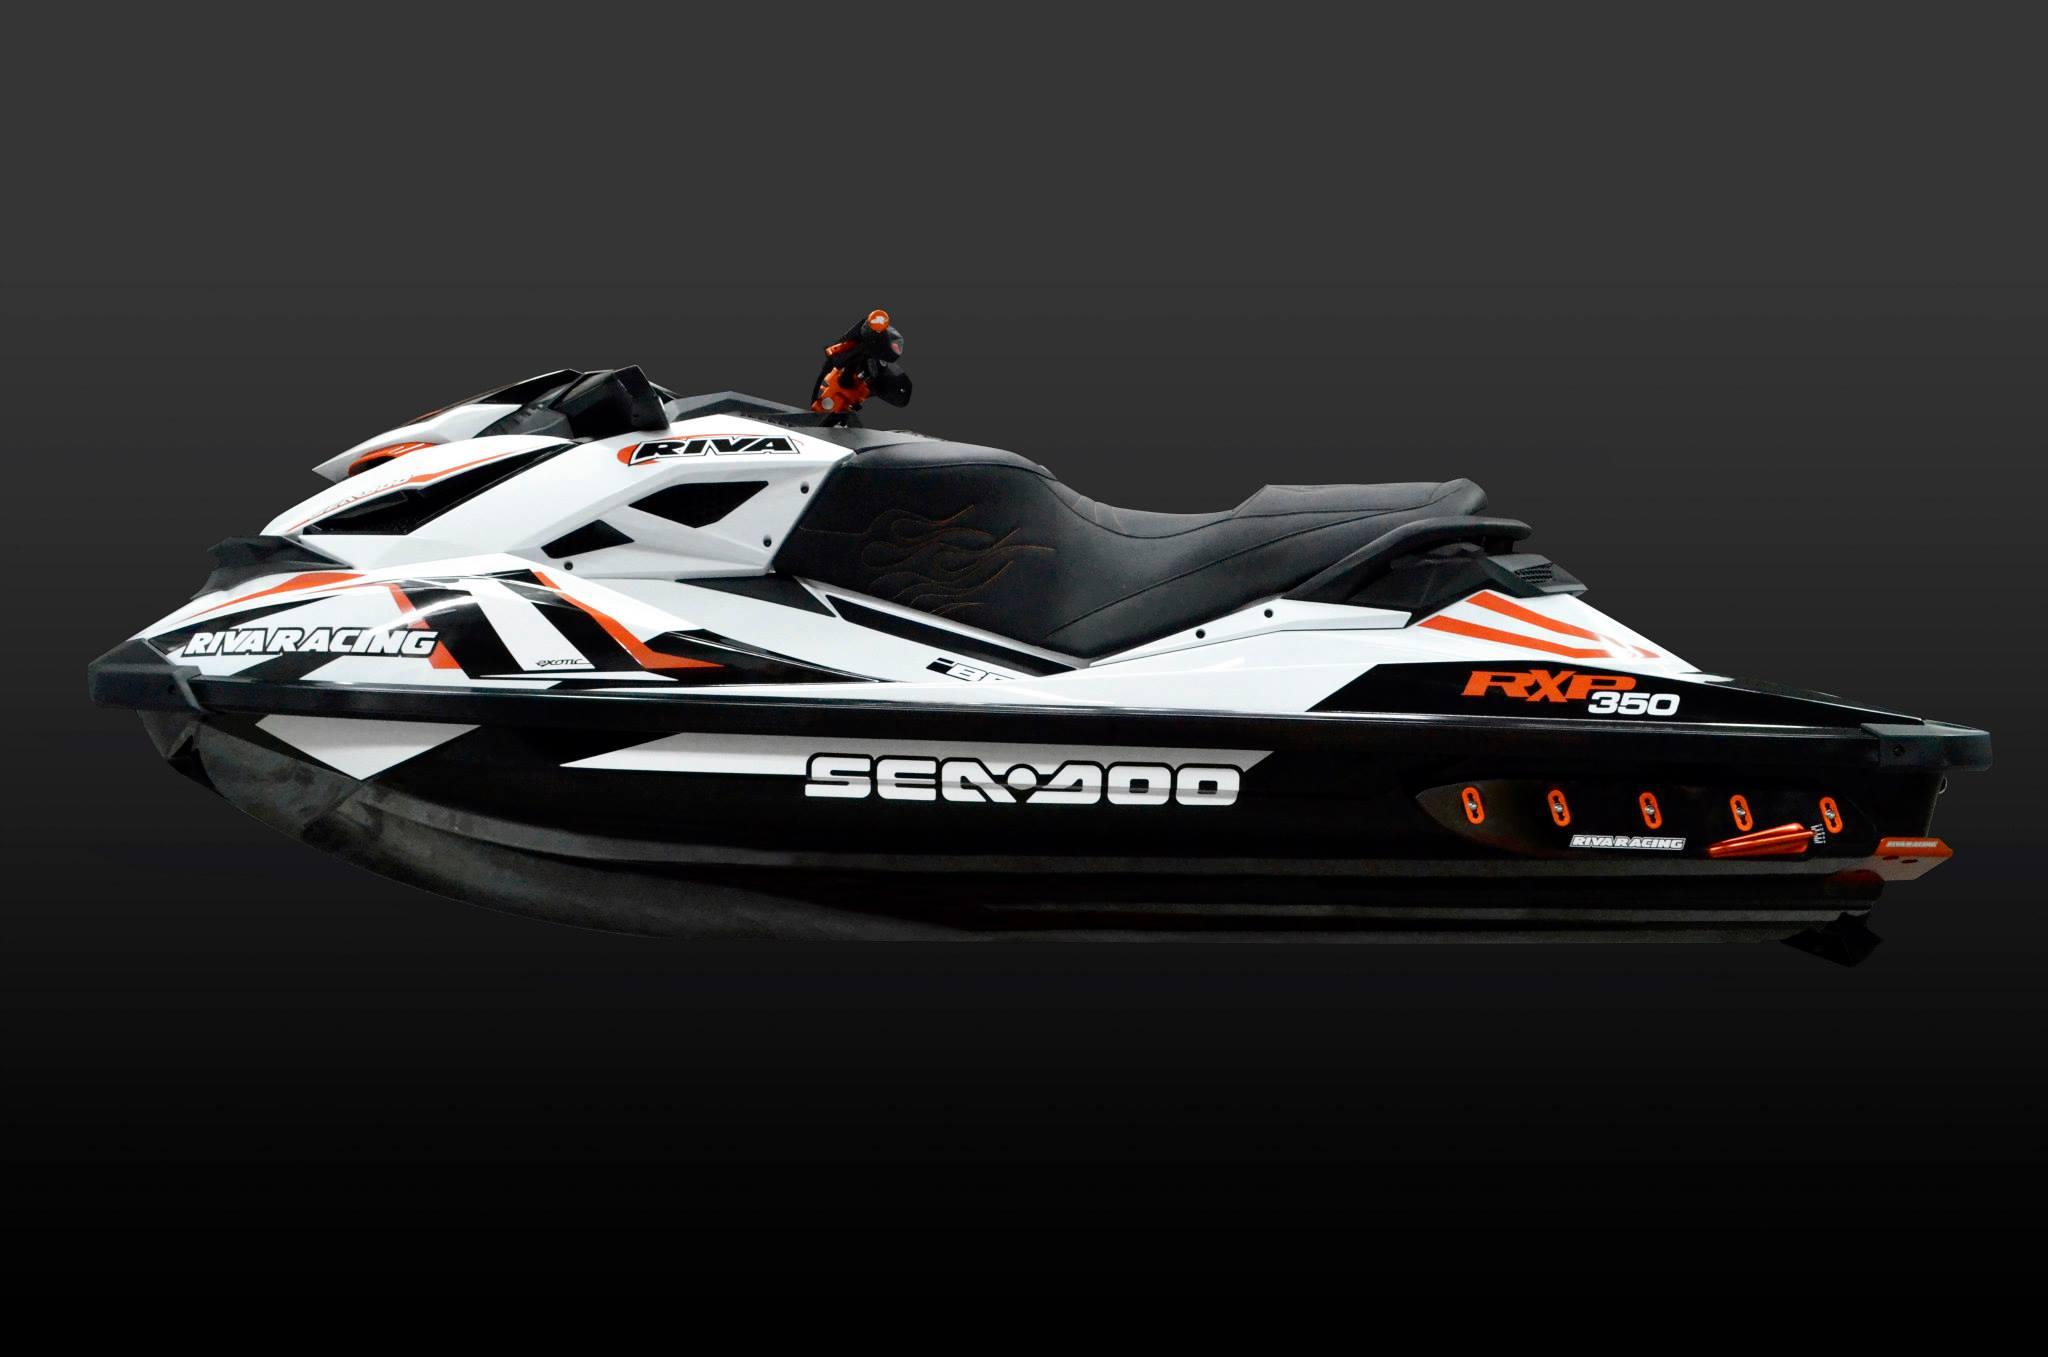 RIVA Racing Sea Doo RXP X 350 2016 petici³n Motos de agua